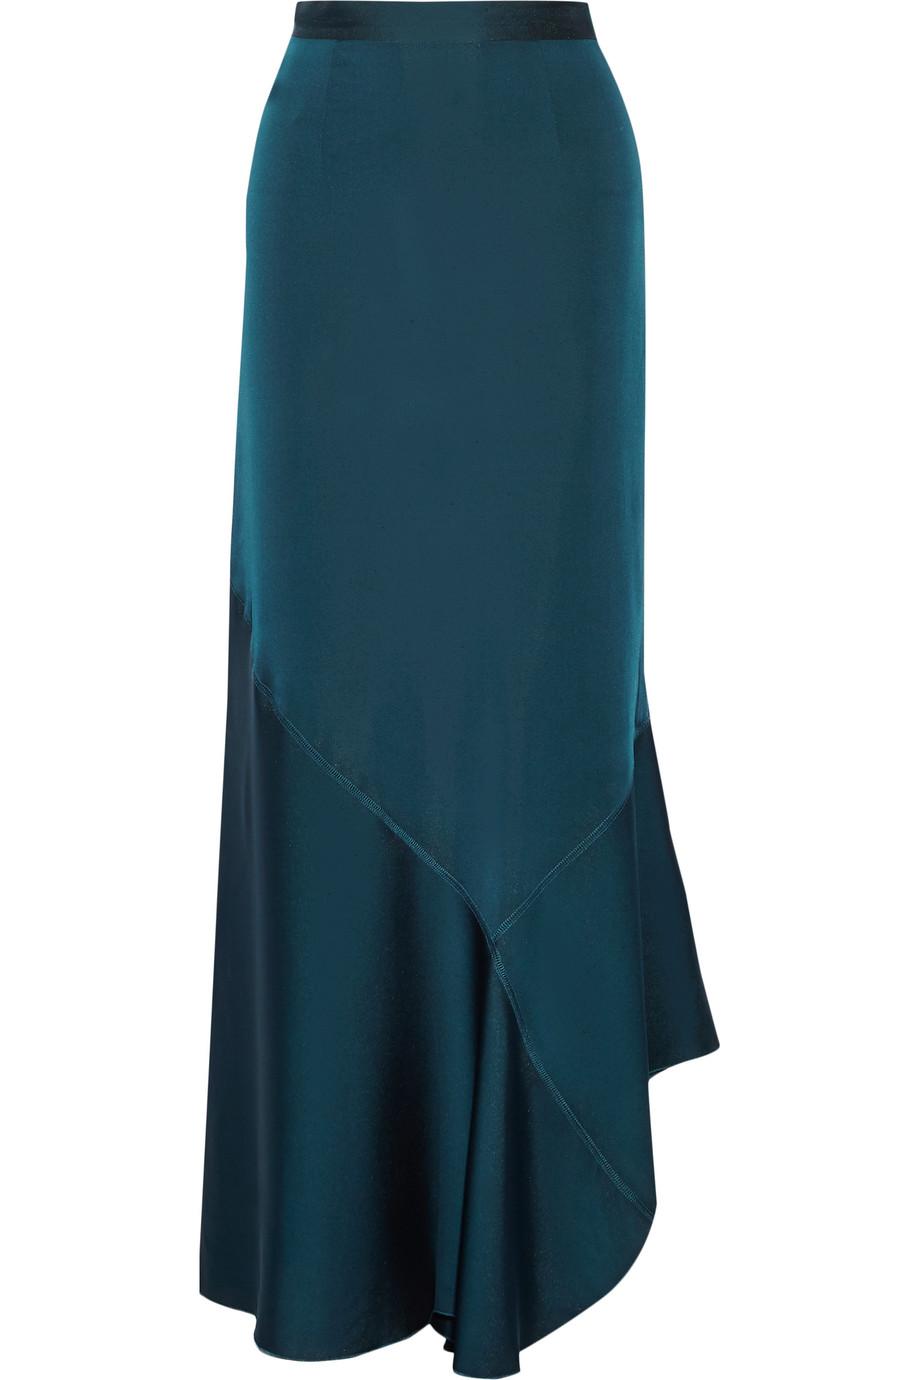 Zalah Stretch-Satin Jersey Maxi Skirt, By Malene Birger, Petrol, Women's, Size: 32